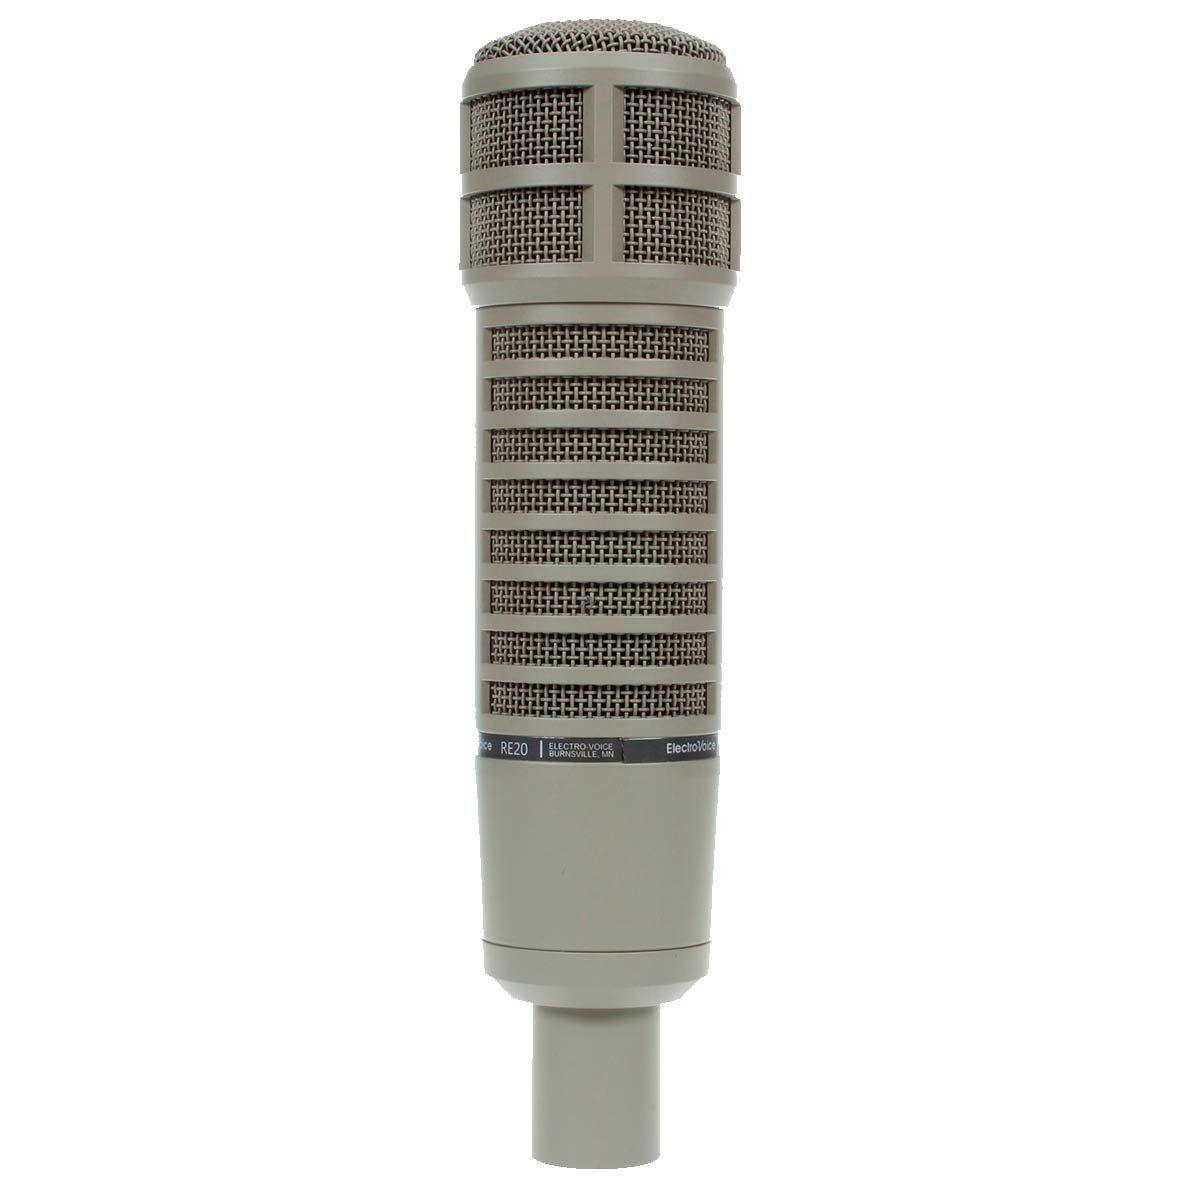 Microfone c/ Fio Dinâmico p/ Estudio - RE 20 Electro Voice